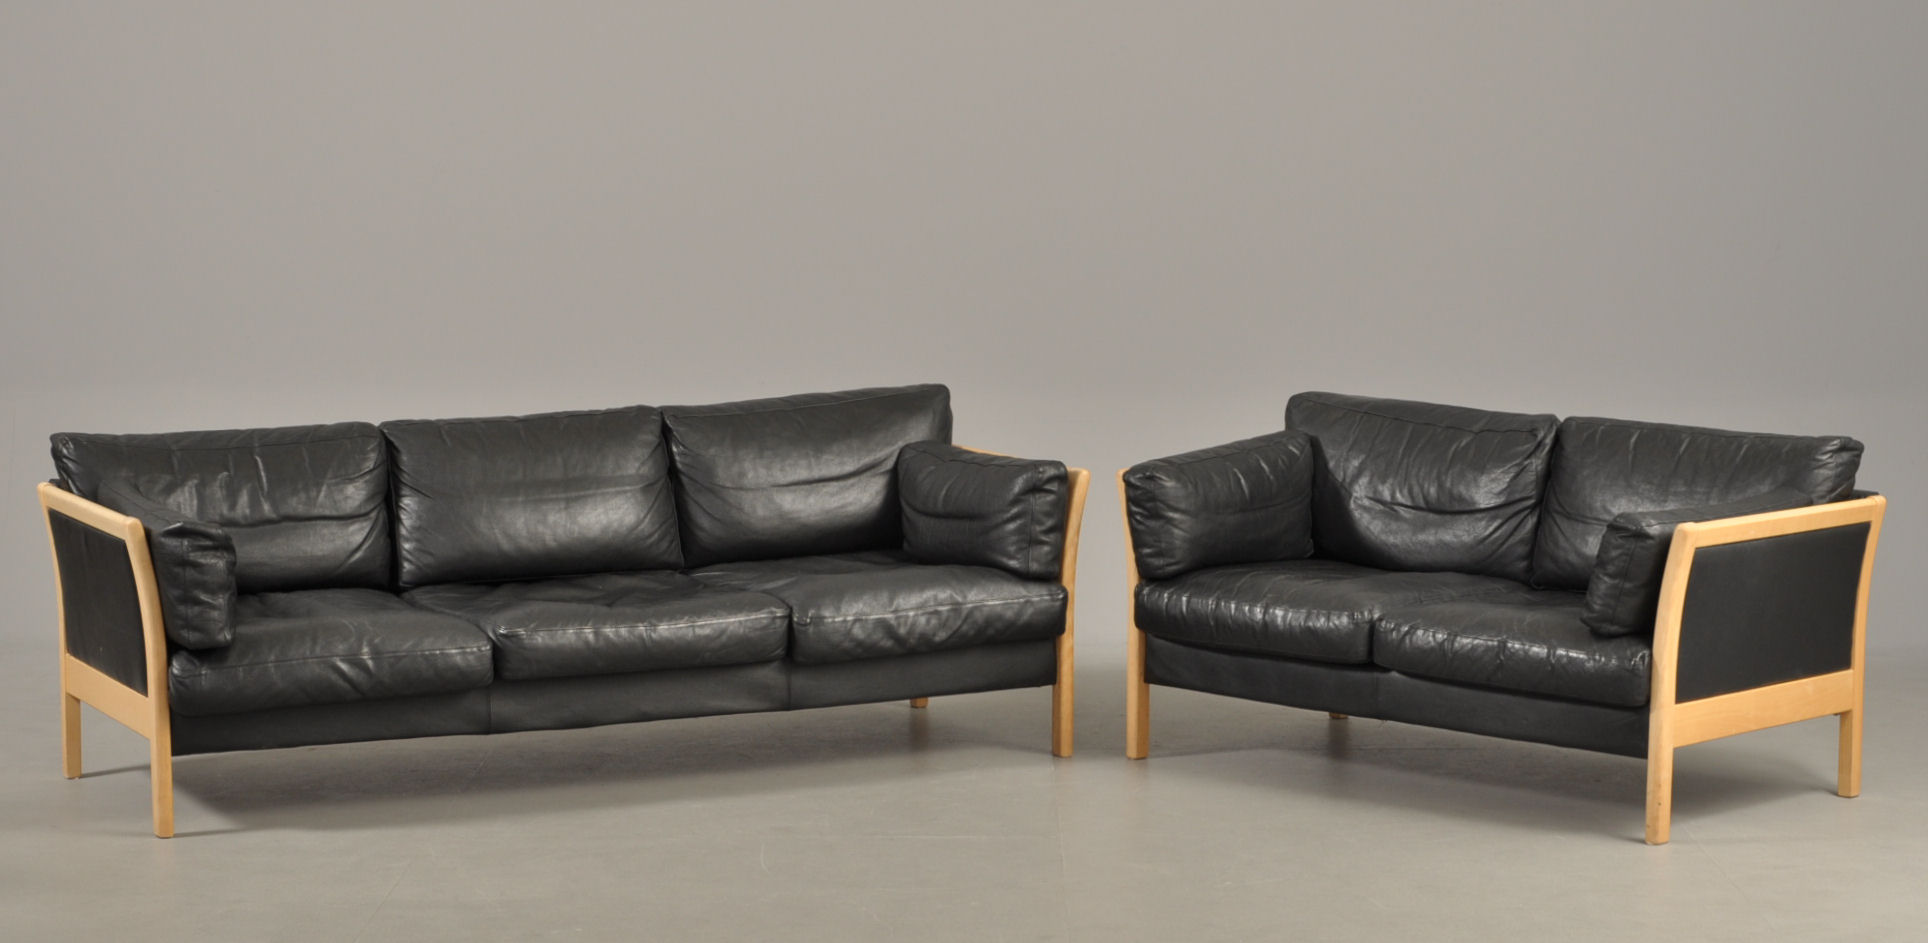 e2376ceeb8a Friis møbler sofa